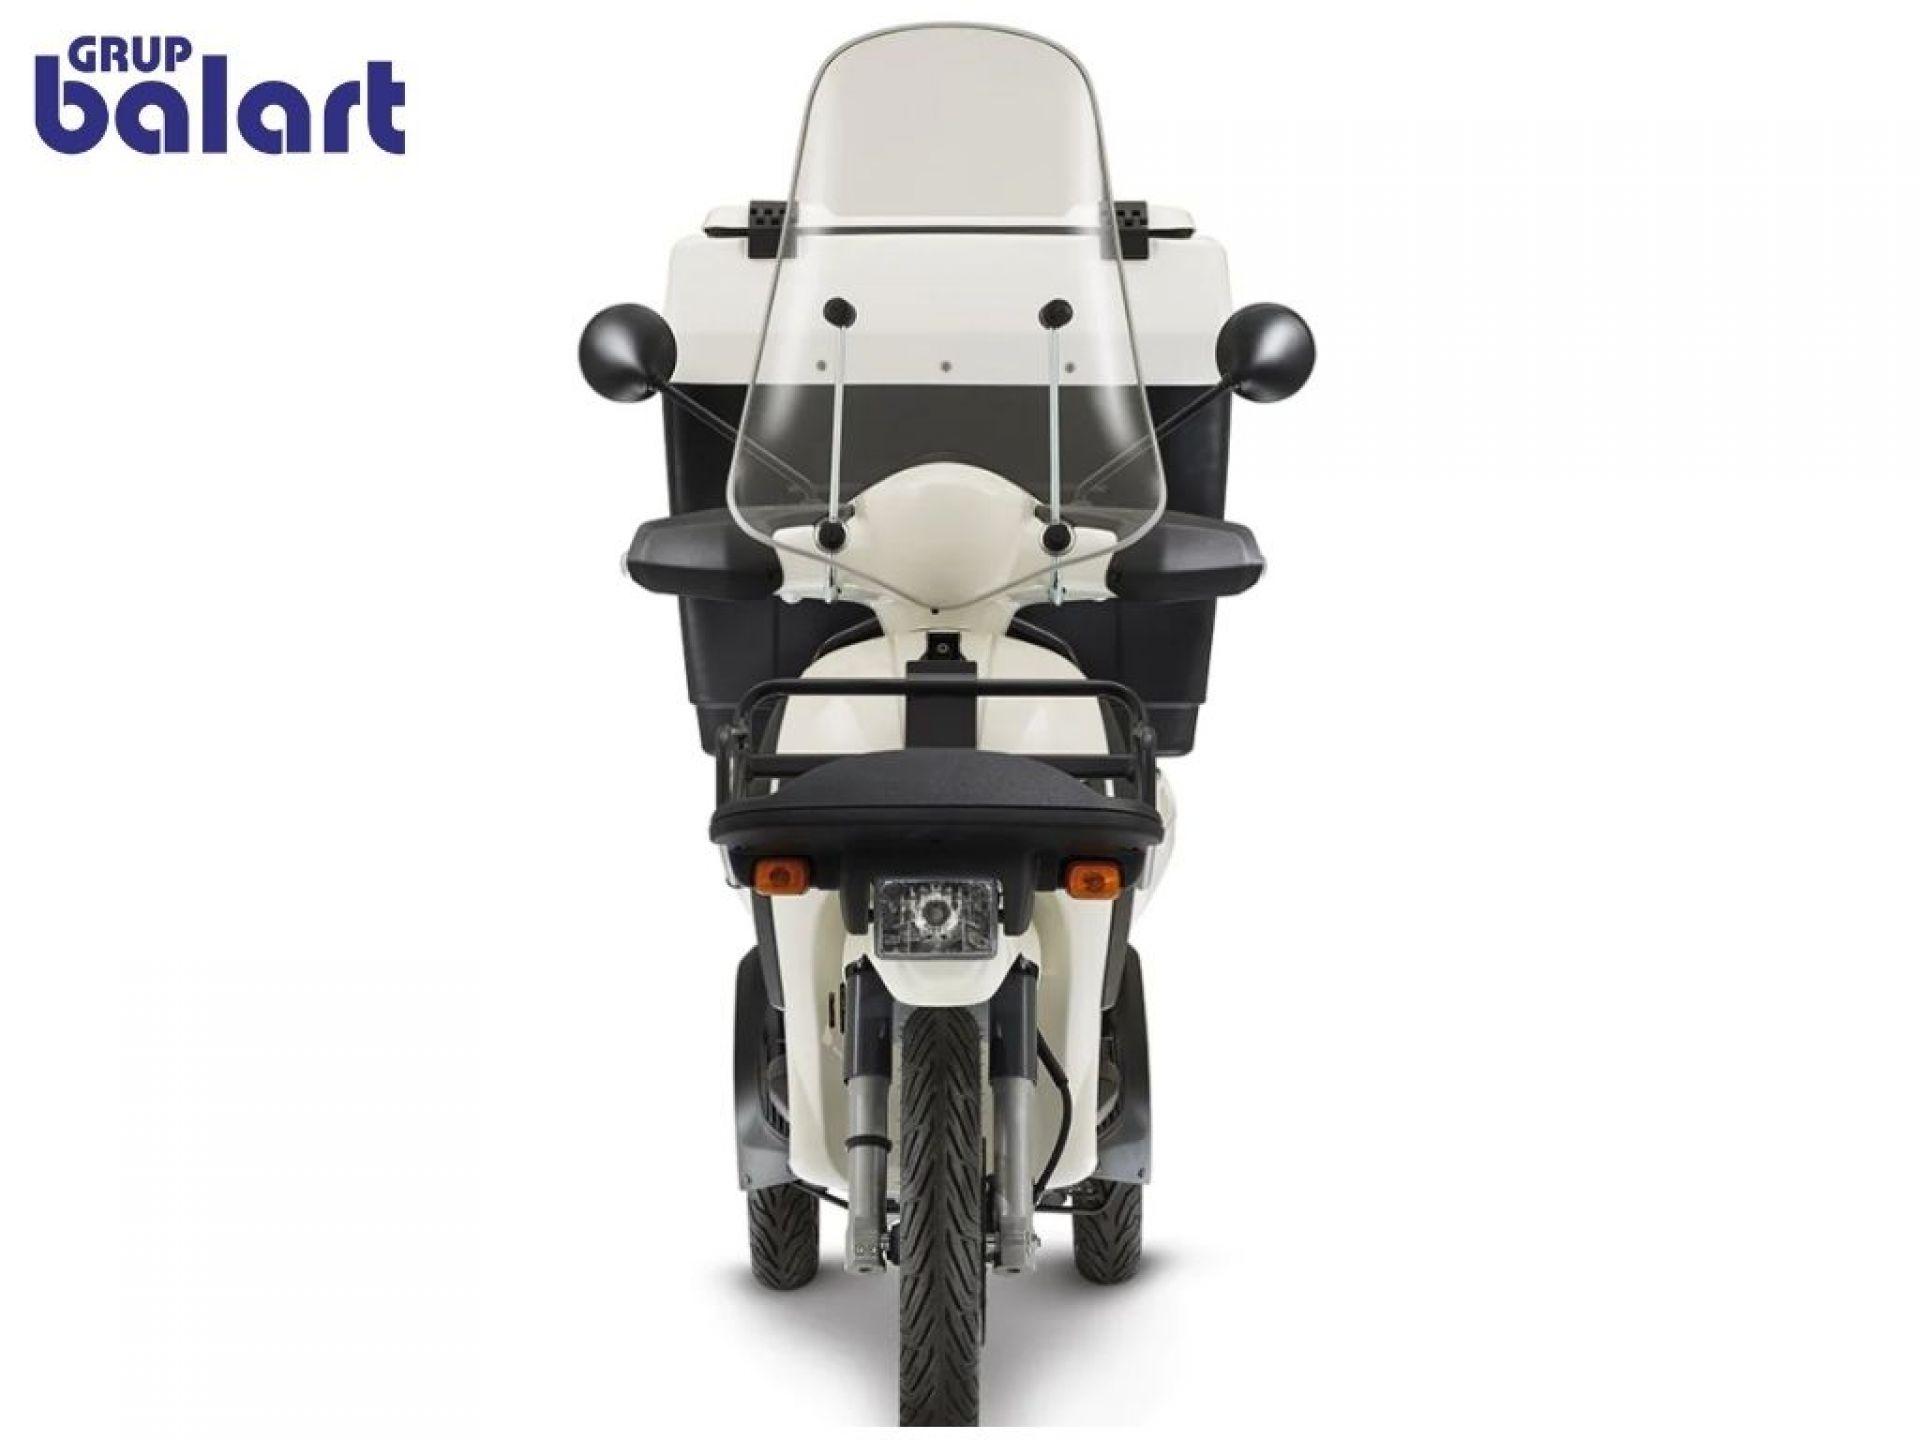 Piaggio Liberty mymoover  125 cc